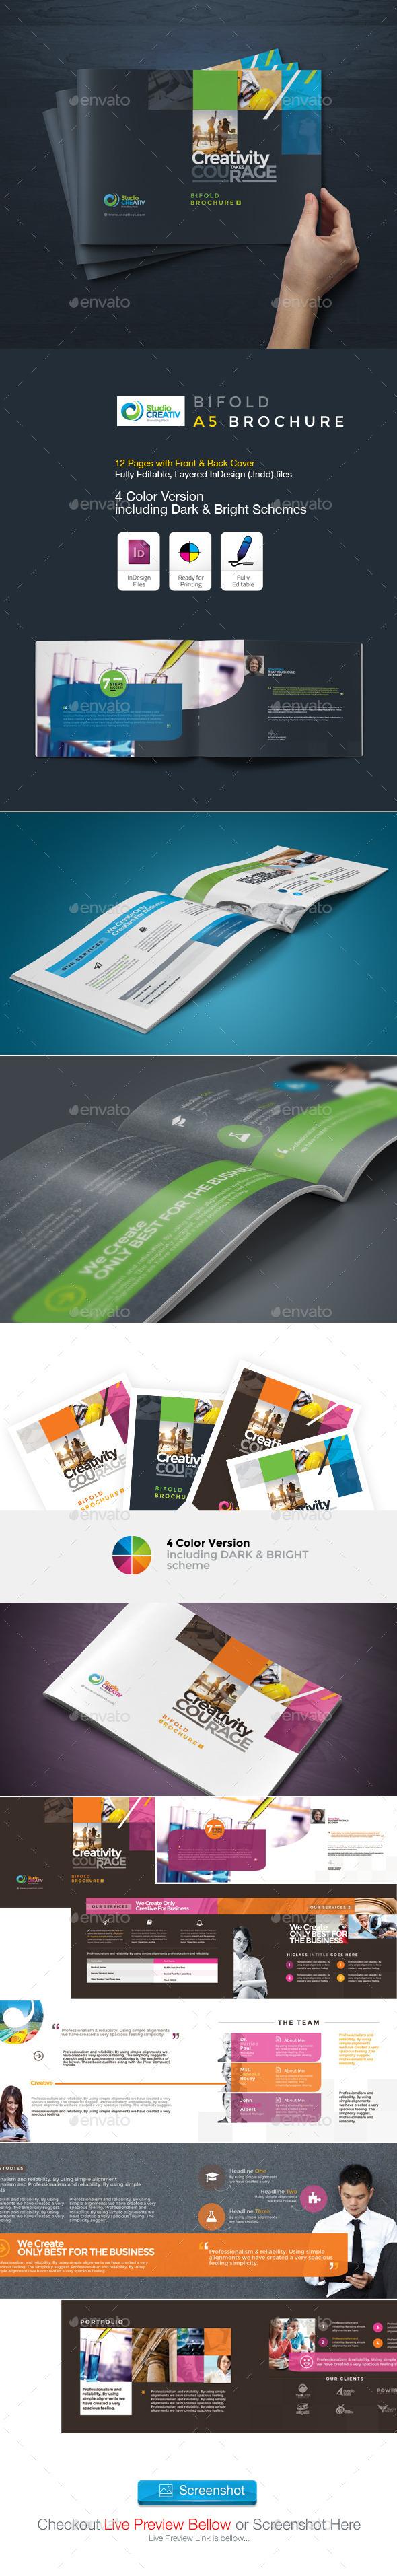 Creative Bifold A5 Brochure